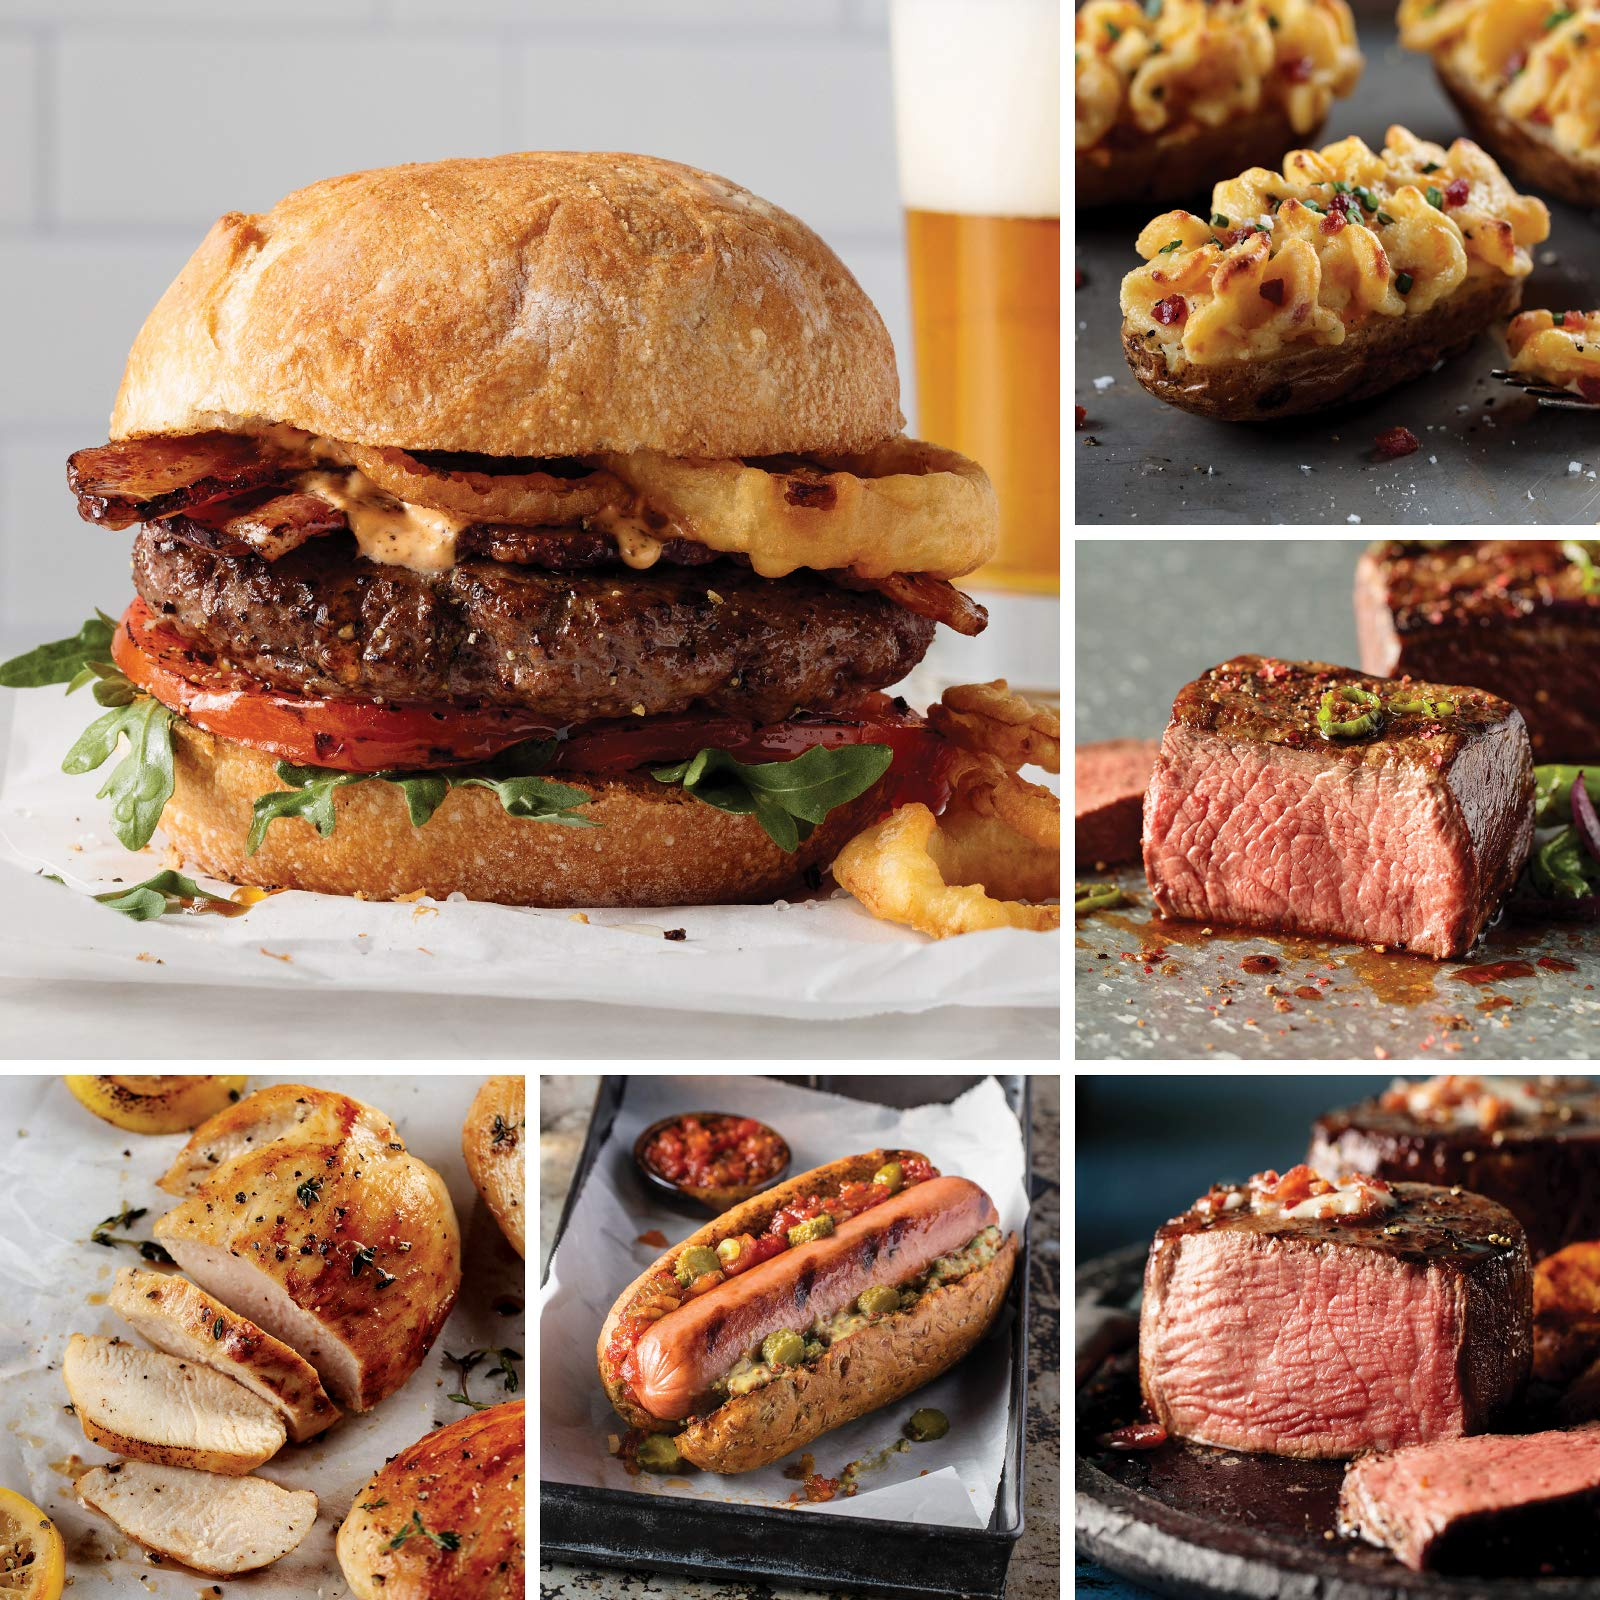 Omaha Steaks Grand Pack (24-Piece with Filet Mignons, Top Sirloins, Boneless Pork Chops, Boneless Chicken Breasts, Steak Burgers, Jumbo Franks, and Stuffed Baked Potatoes)